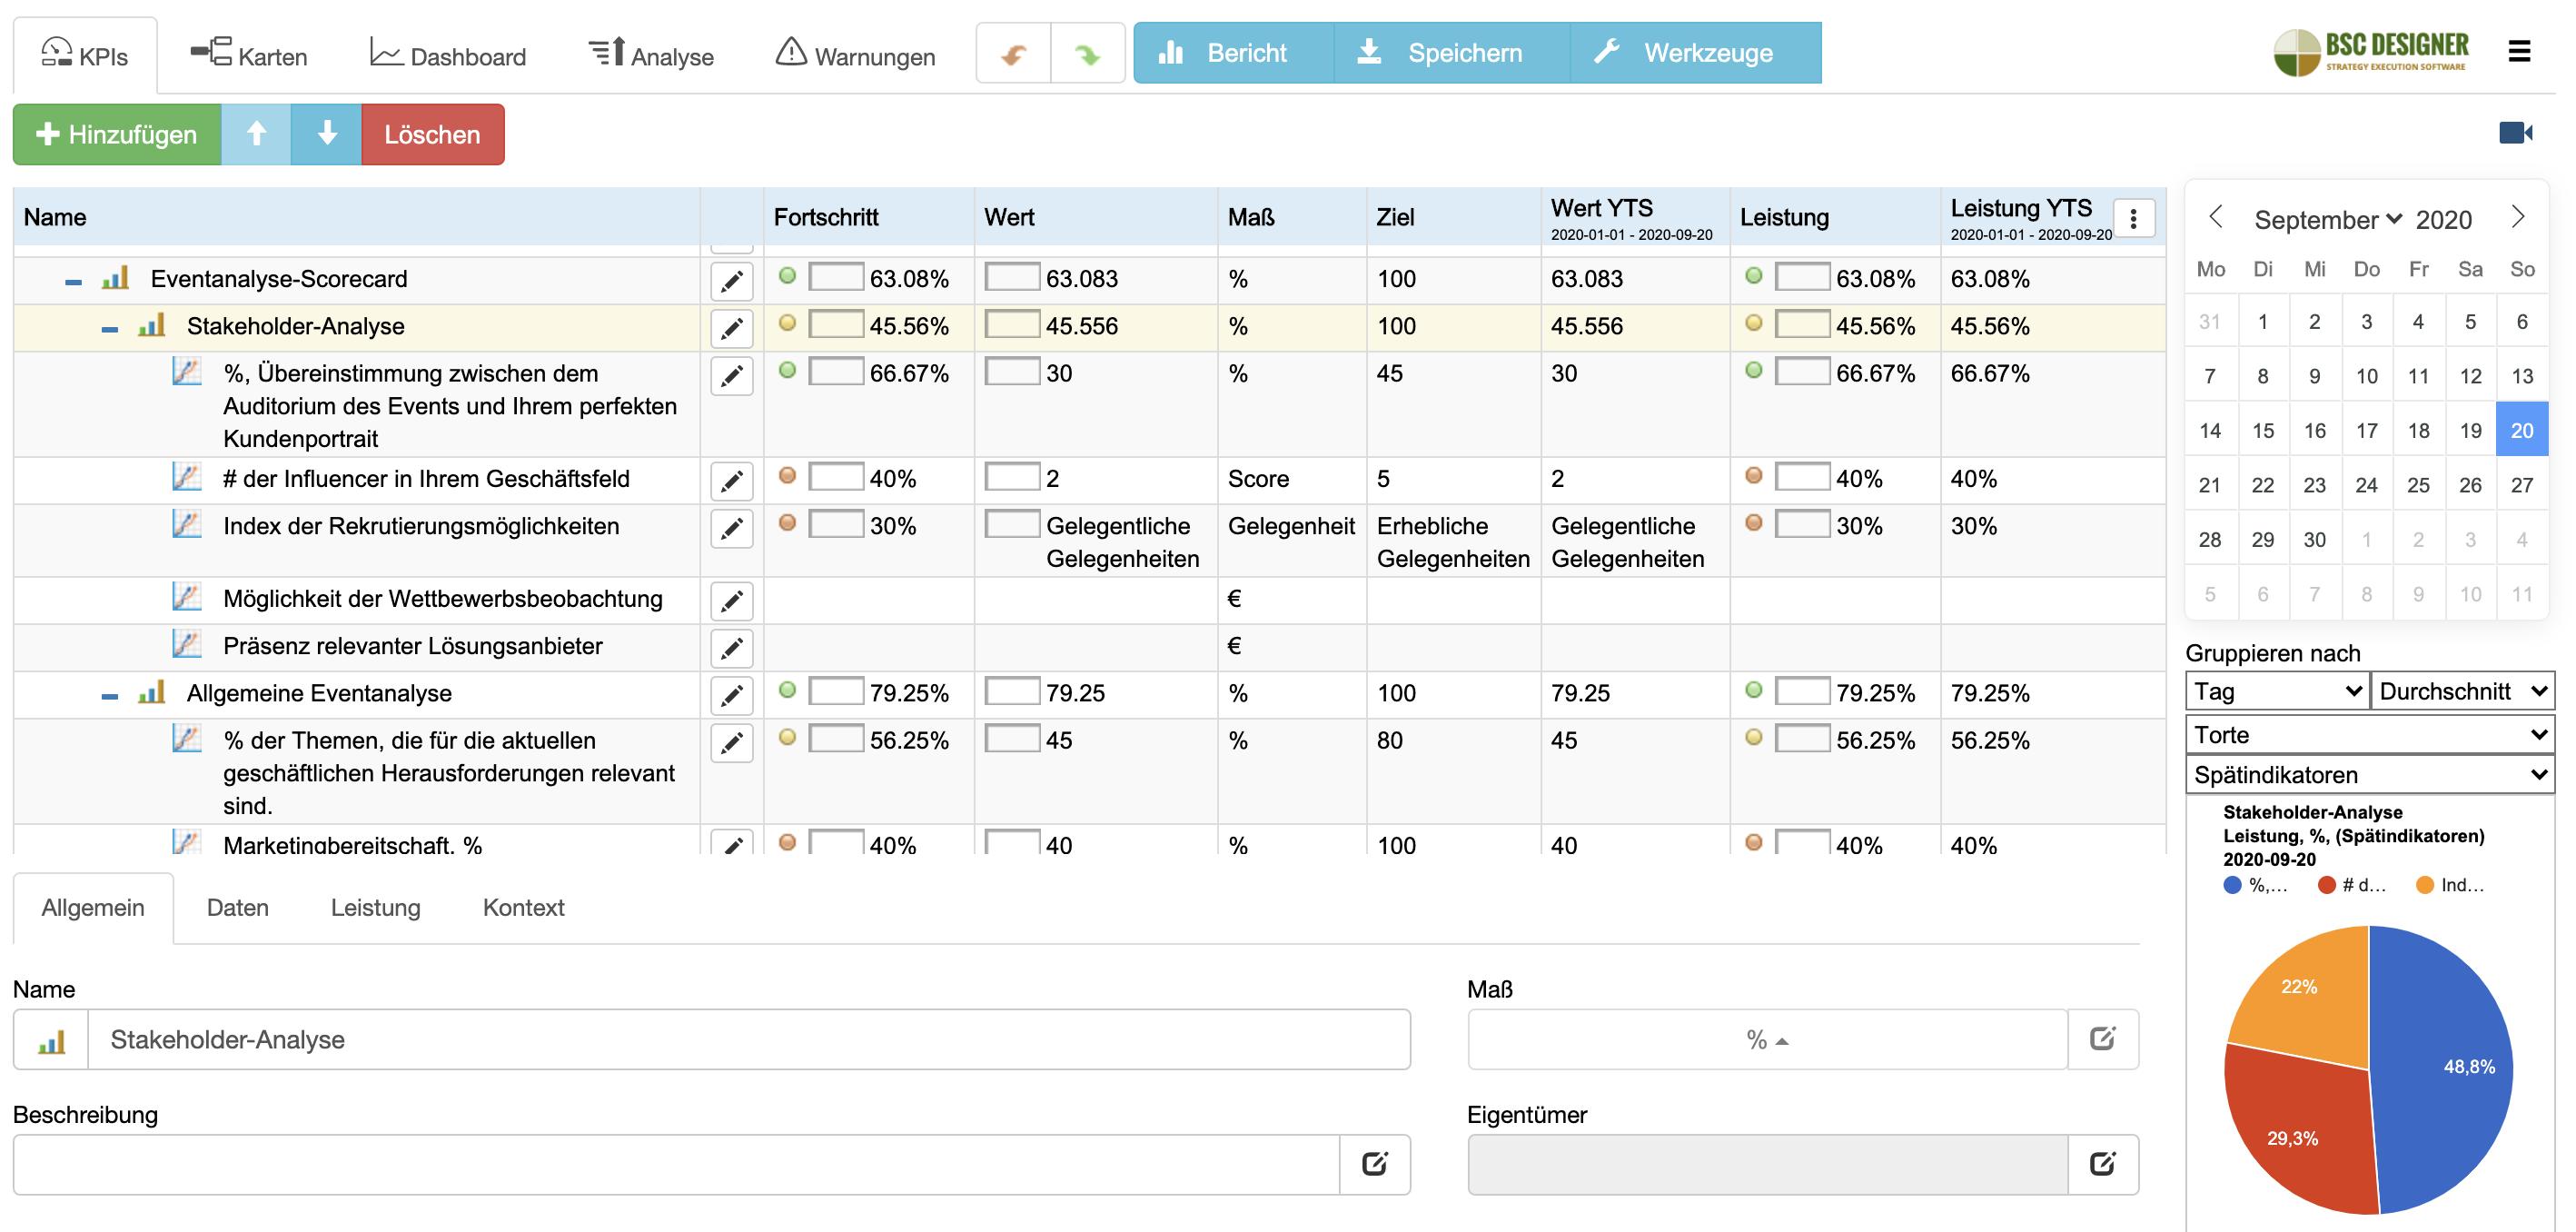 Eventanalyse-Scorecard: Stakeholder-Analyse